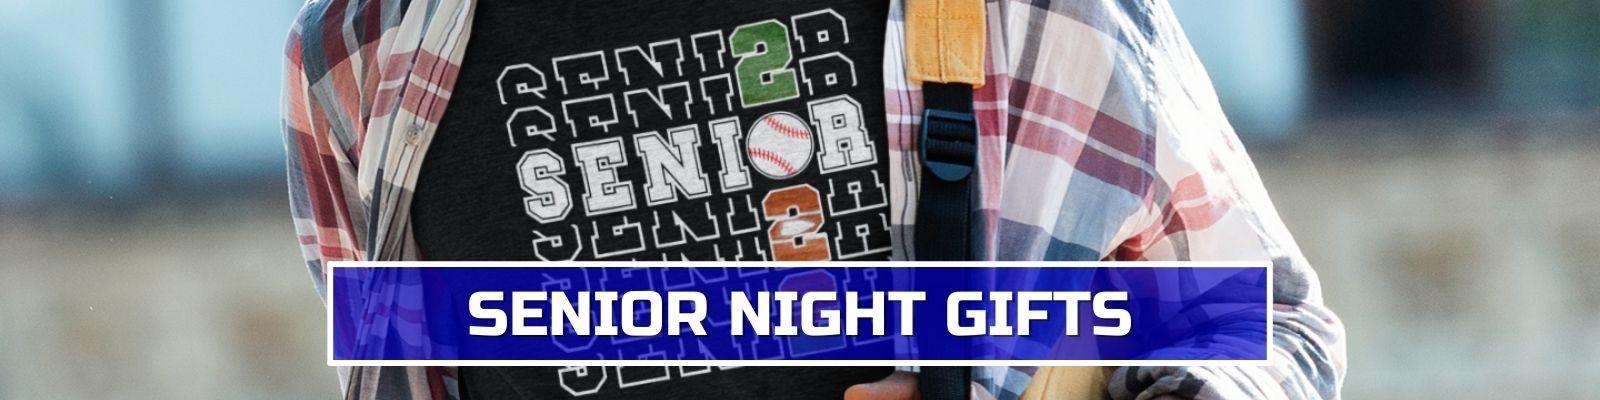 senior-night-gifts